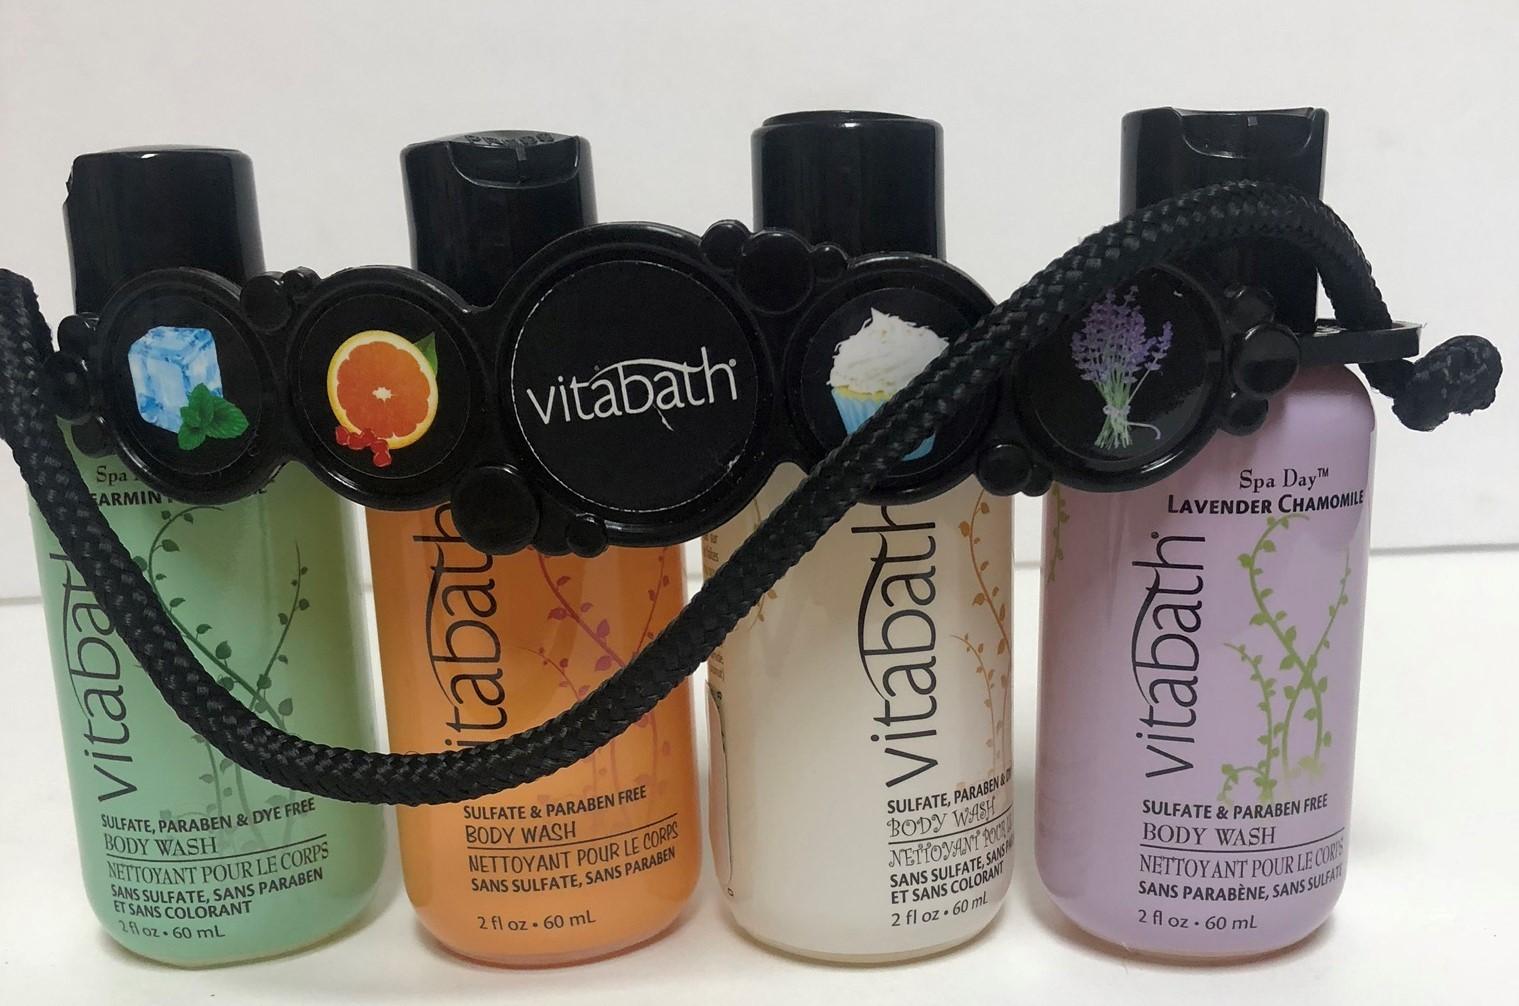 Vitabath Gift Set Body Wash 4-2 OZ Bottles Spearment Orange Coconut Lavender image 2